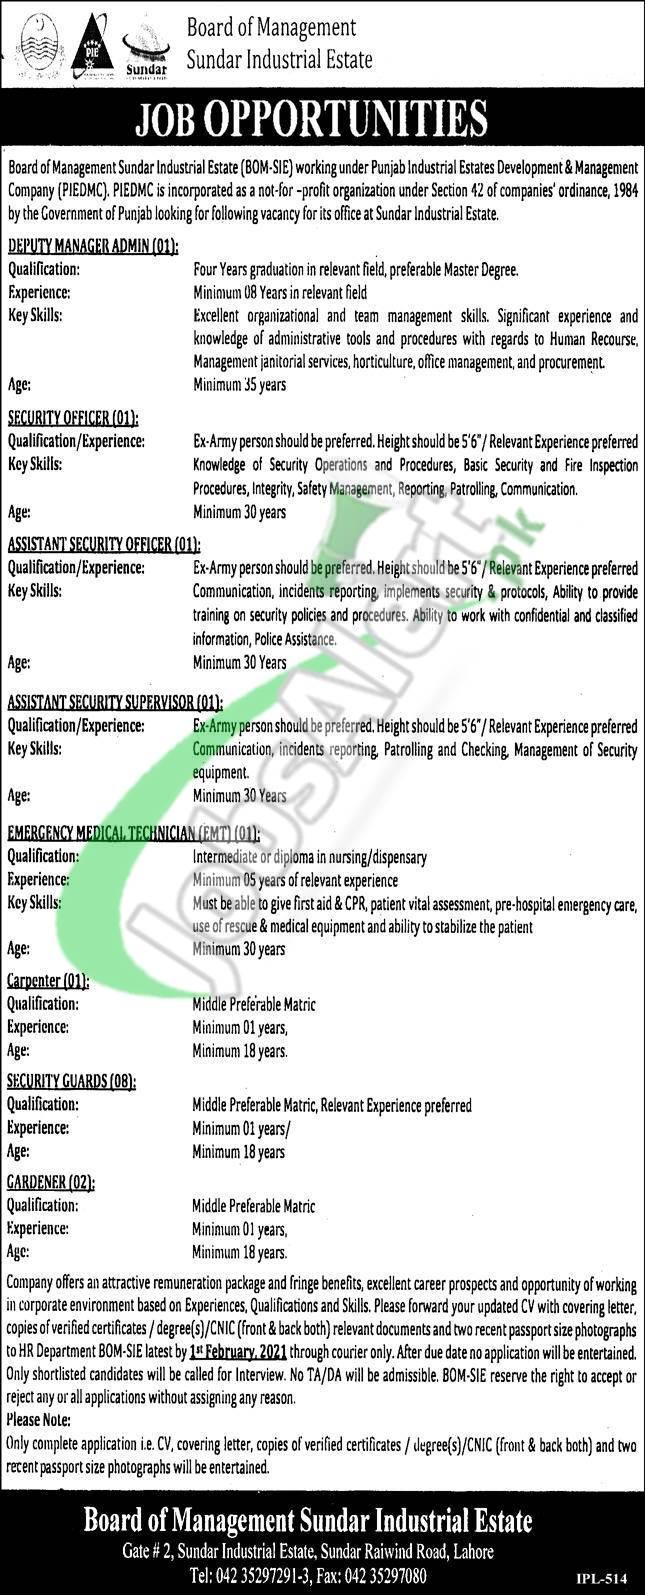 Board of Management Sundar Industrial Estate Jobs